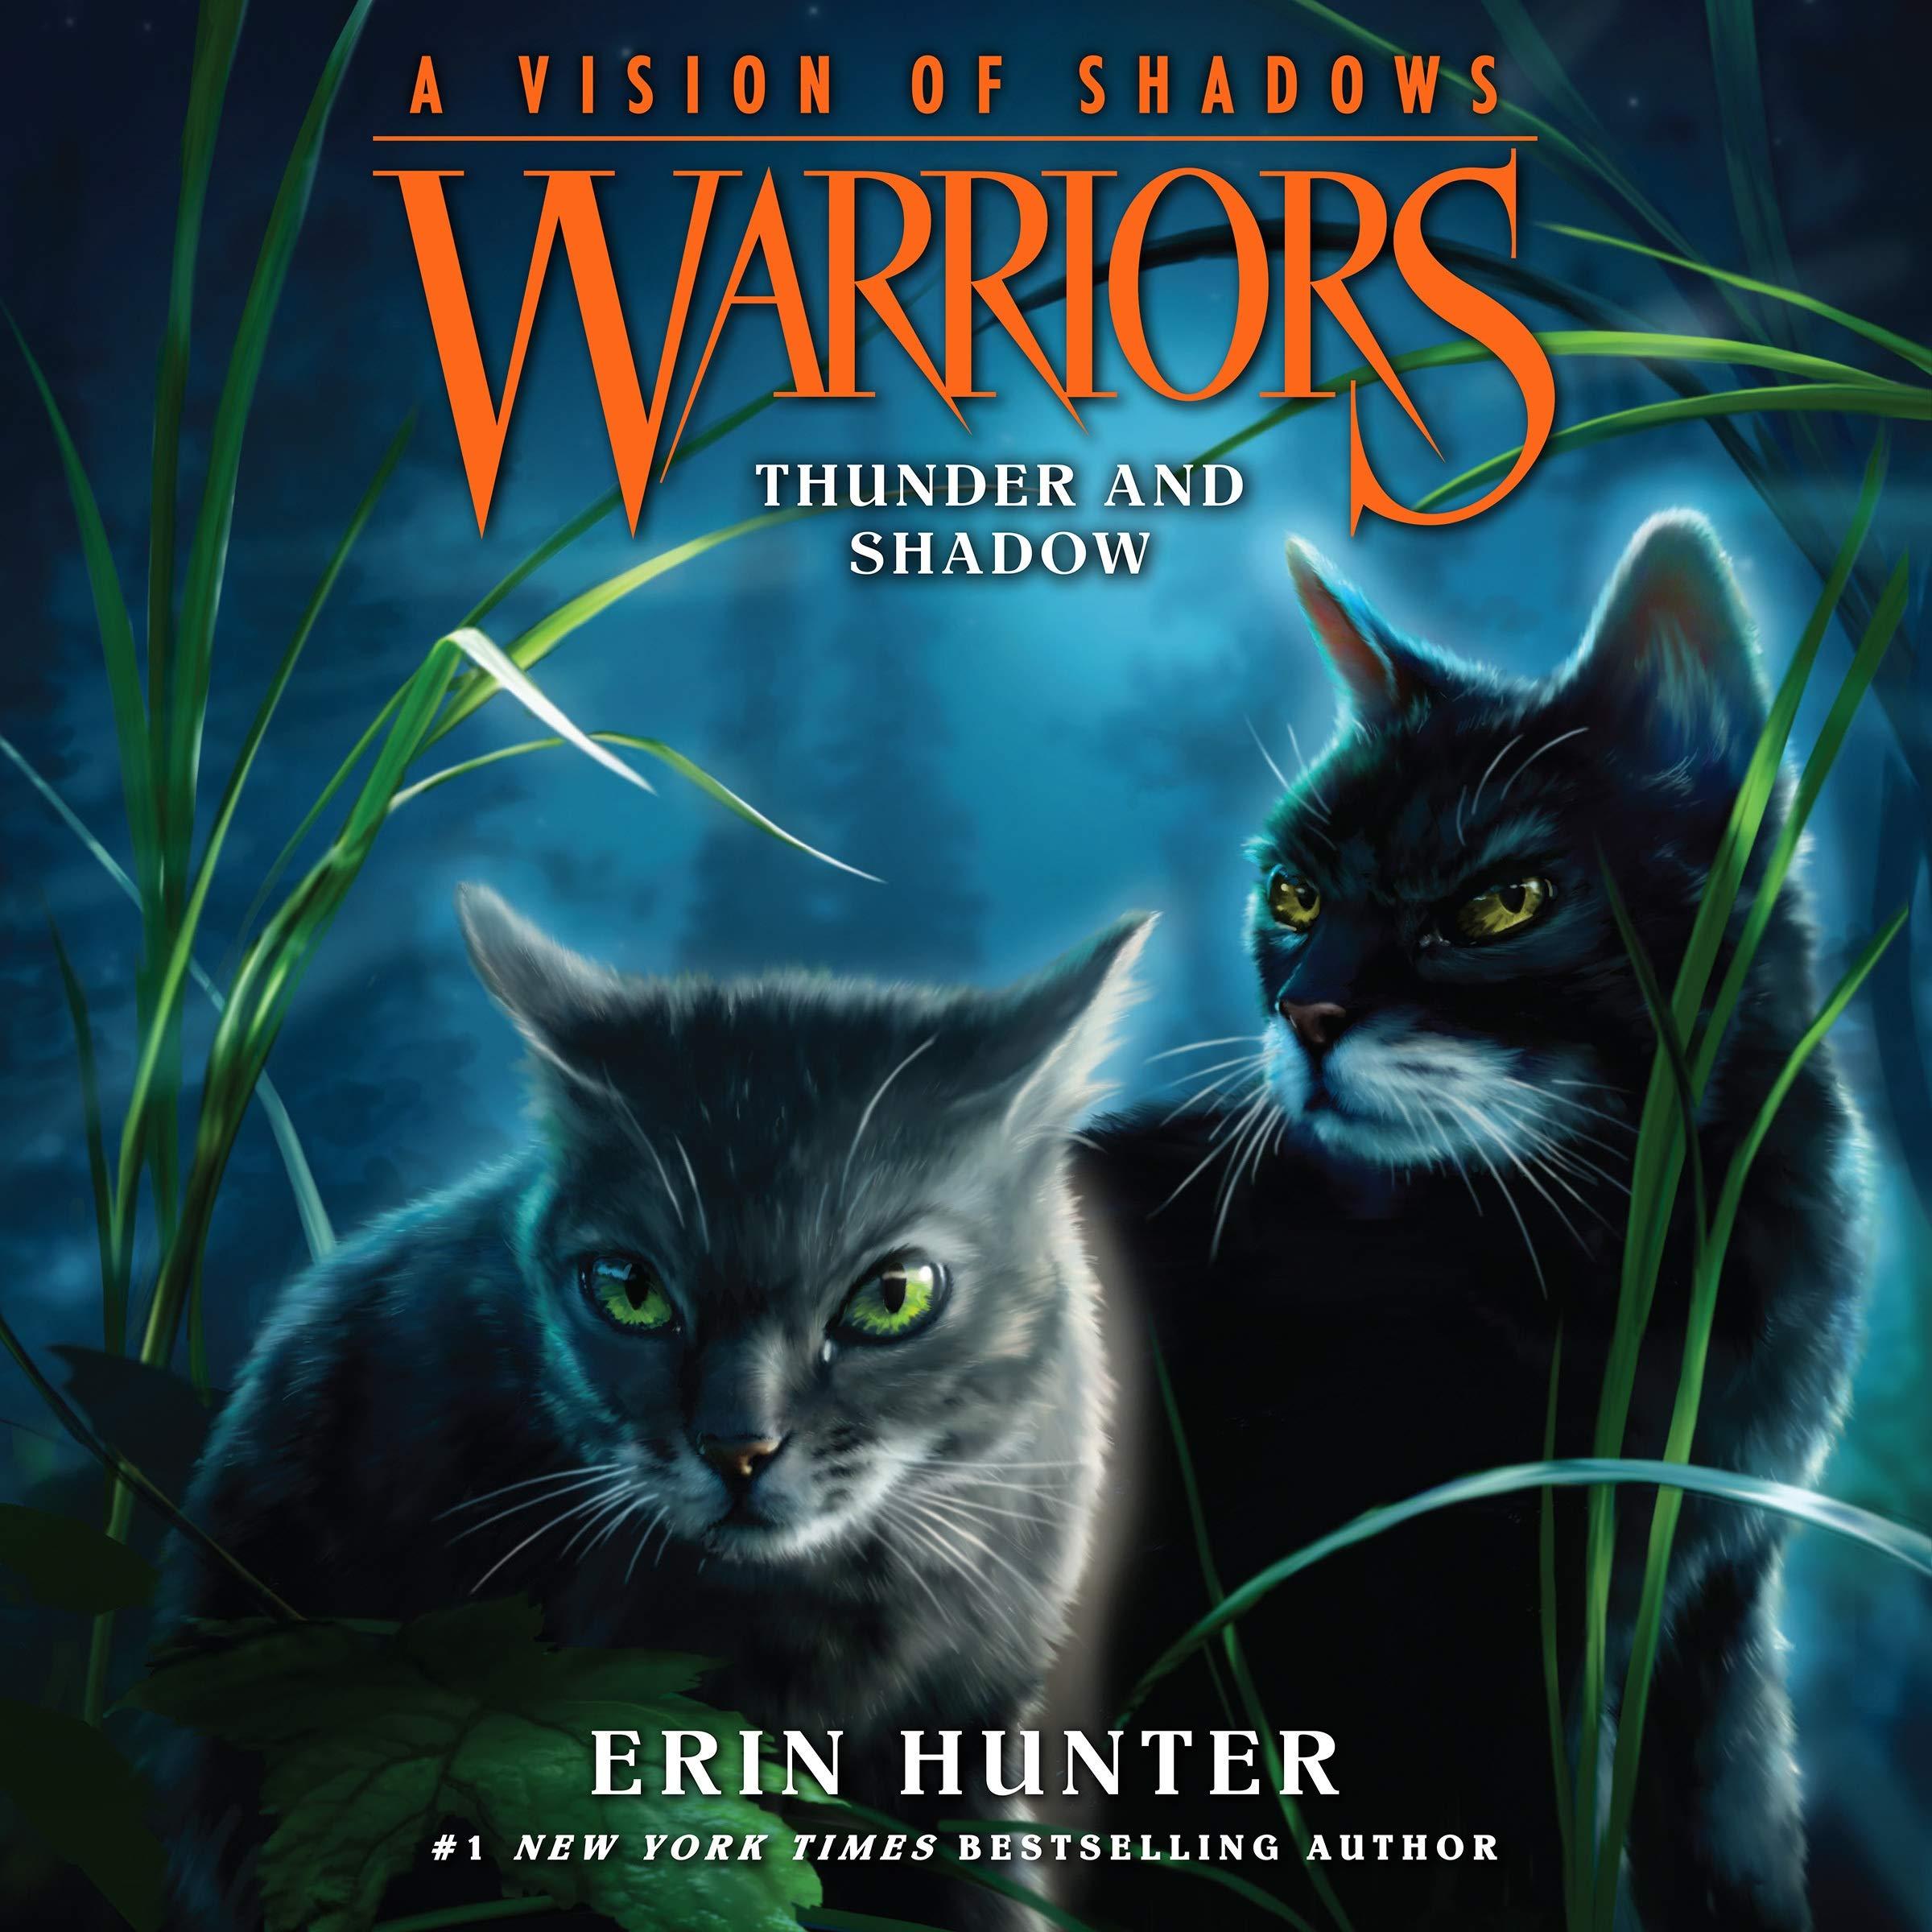 Thunder and Shadow (Warriors: a Vision of Shadows)